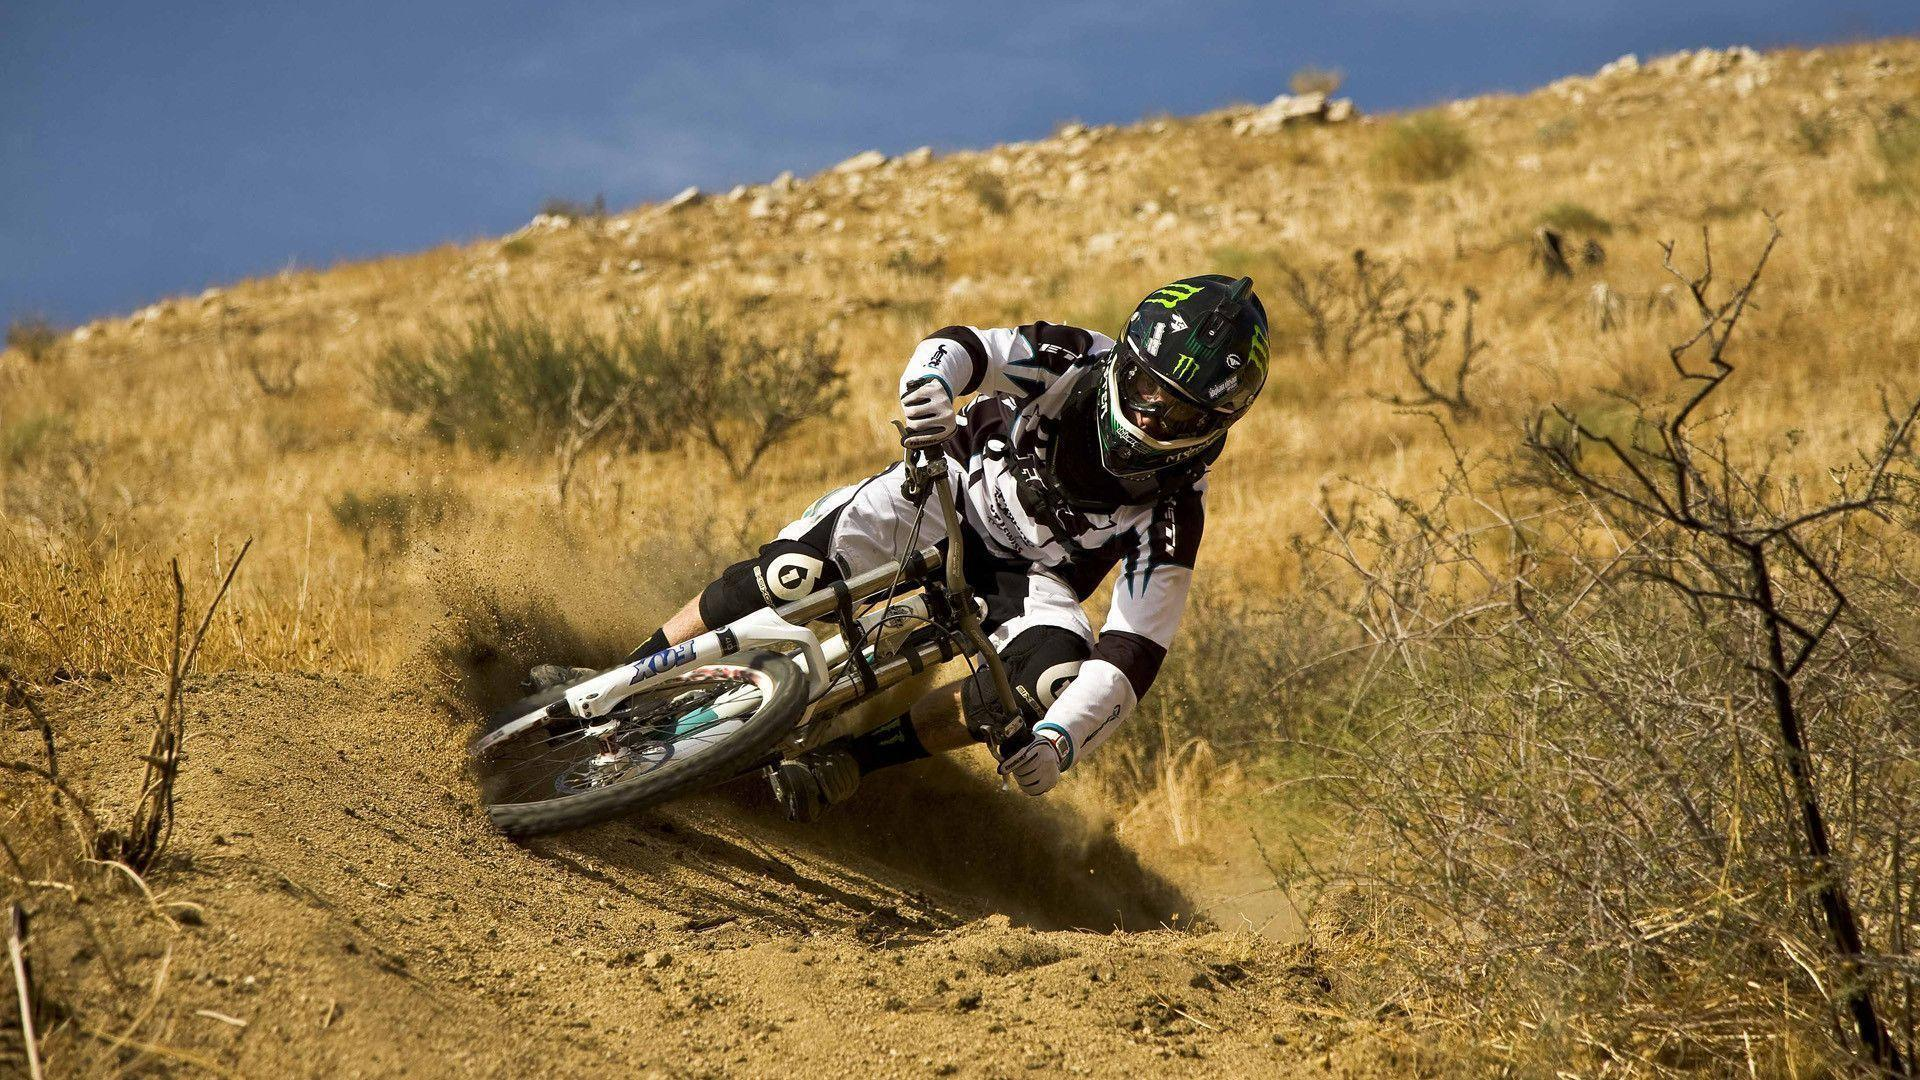 wallpaper bike sport downhill - photo #22